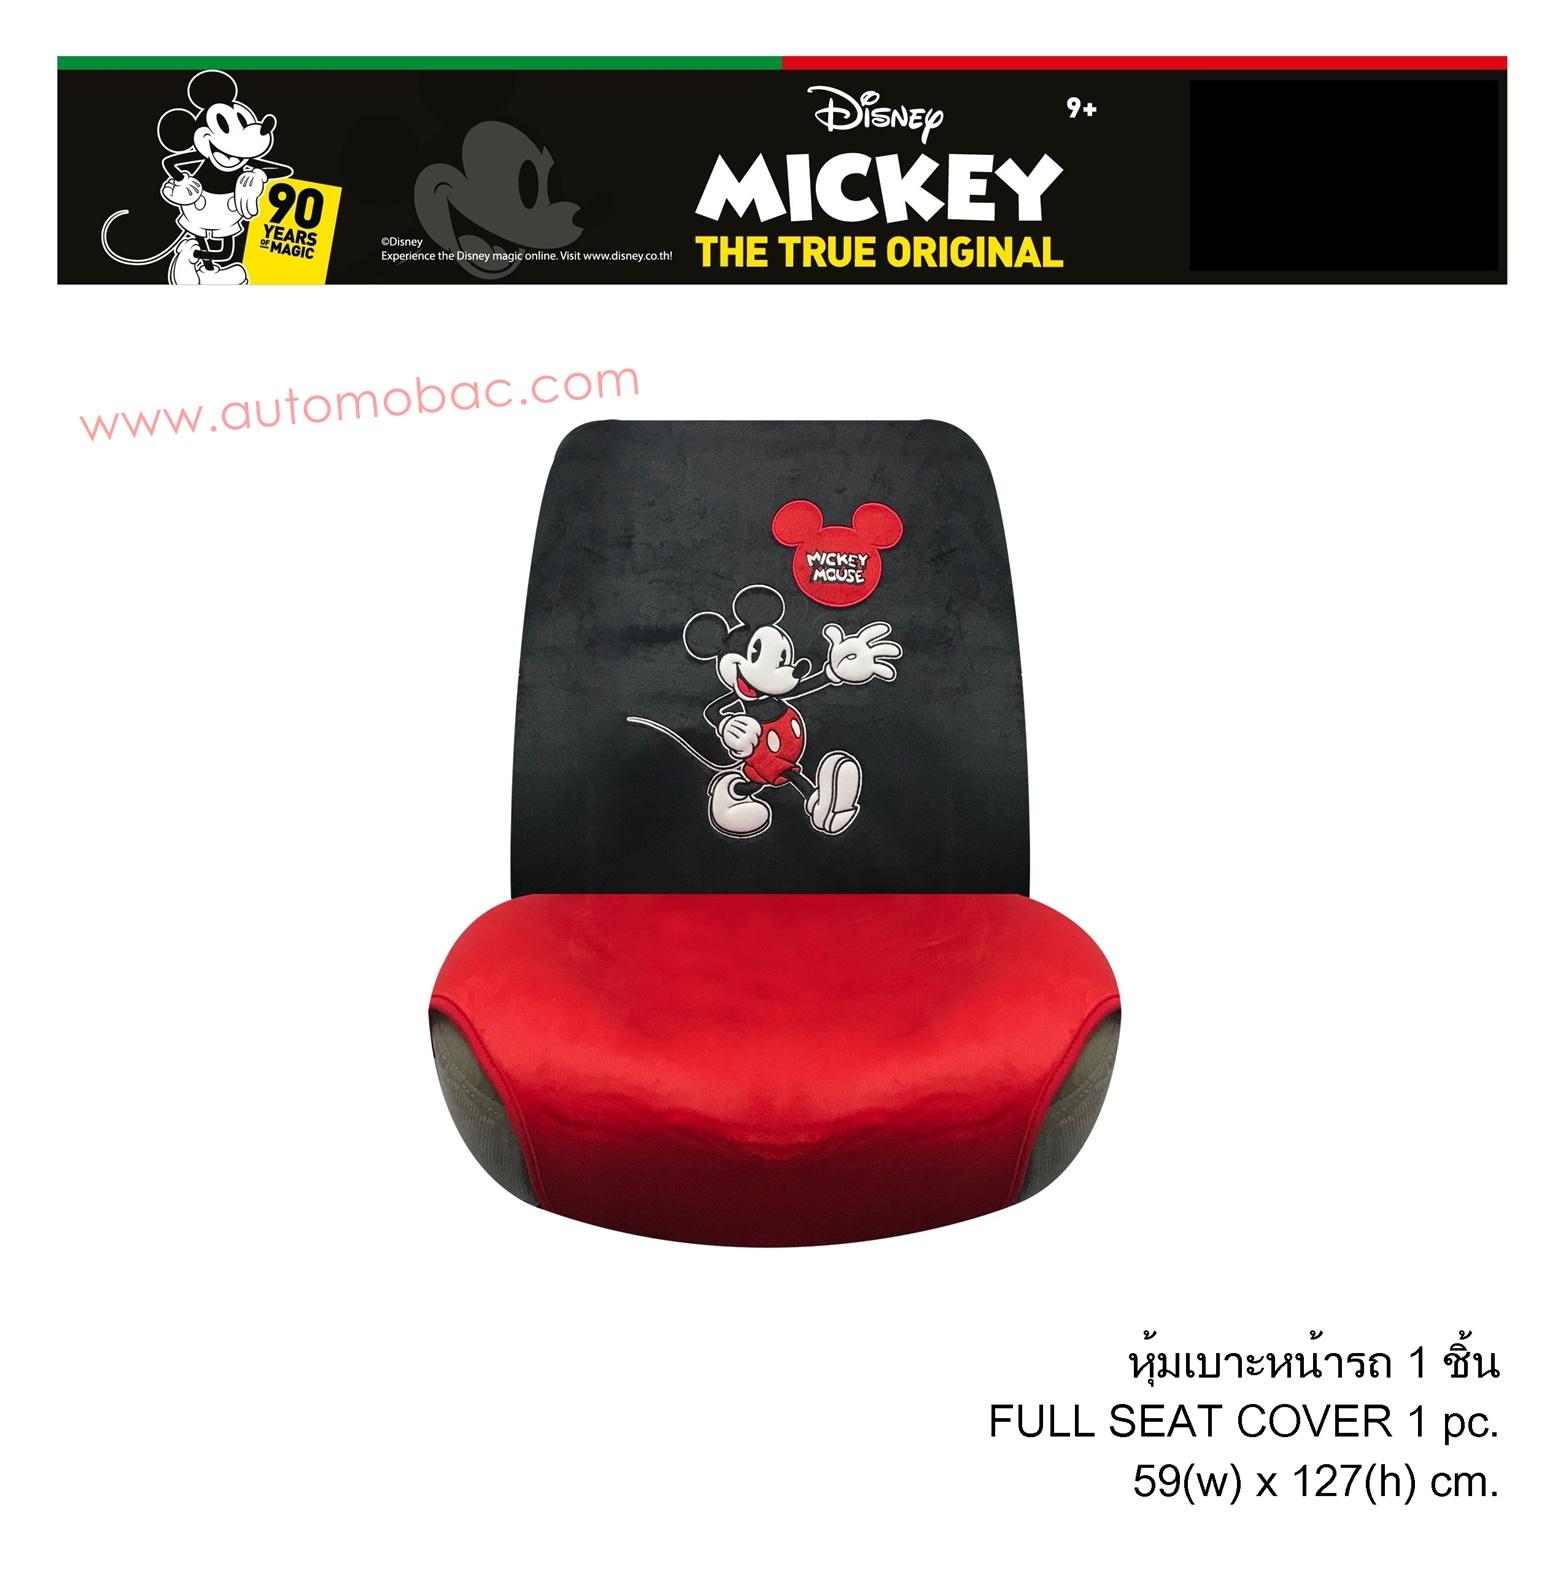 Mickey Mouse PROUD ที่หุ้มเบาะเต็มตัว 1 ชิ้น ลิขสิทธิ์แท้ ปกป้องจากความร้อน รอยขีดข่วน สิ่งสกปรก